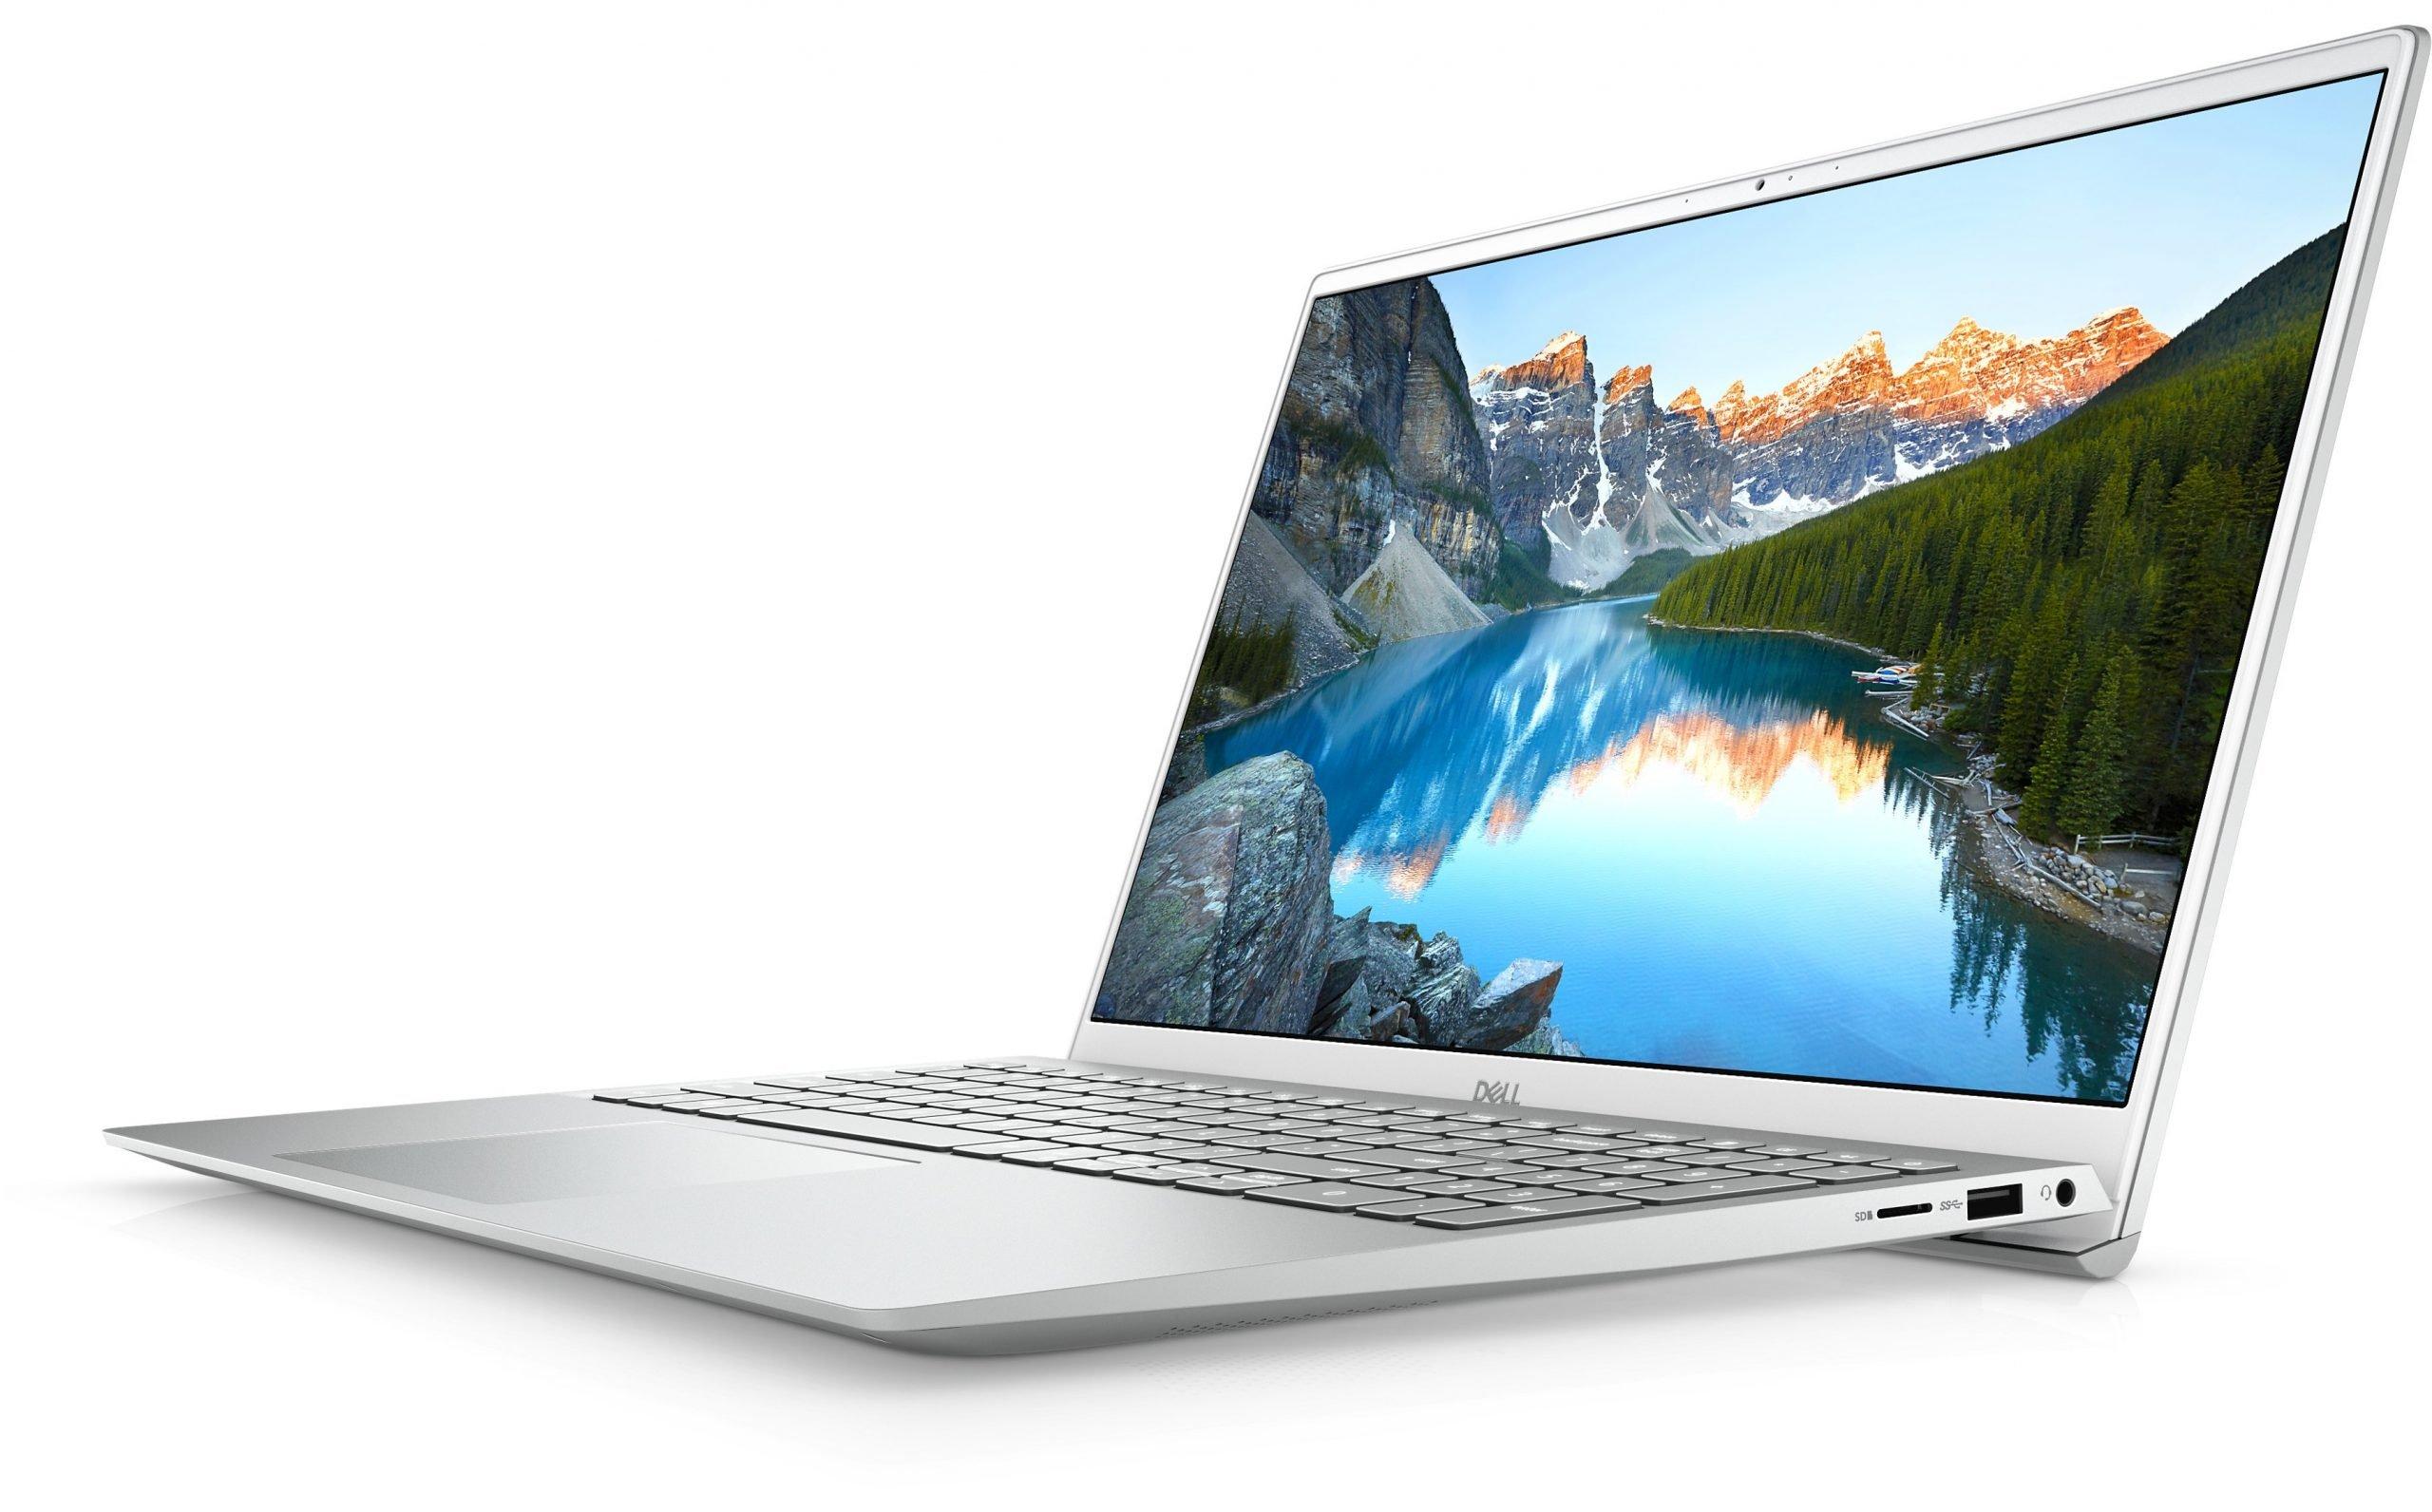 Inspiron 14 5402 Laptop at Rs. 59,990